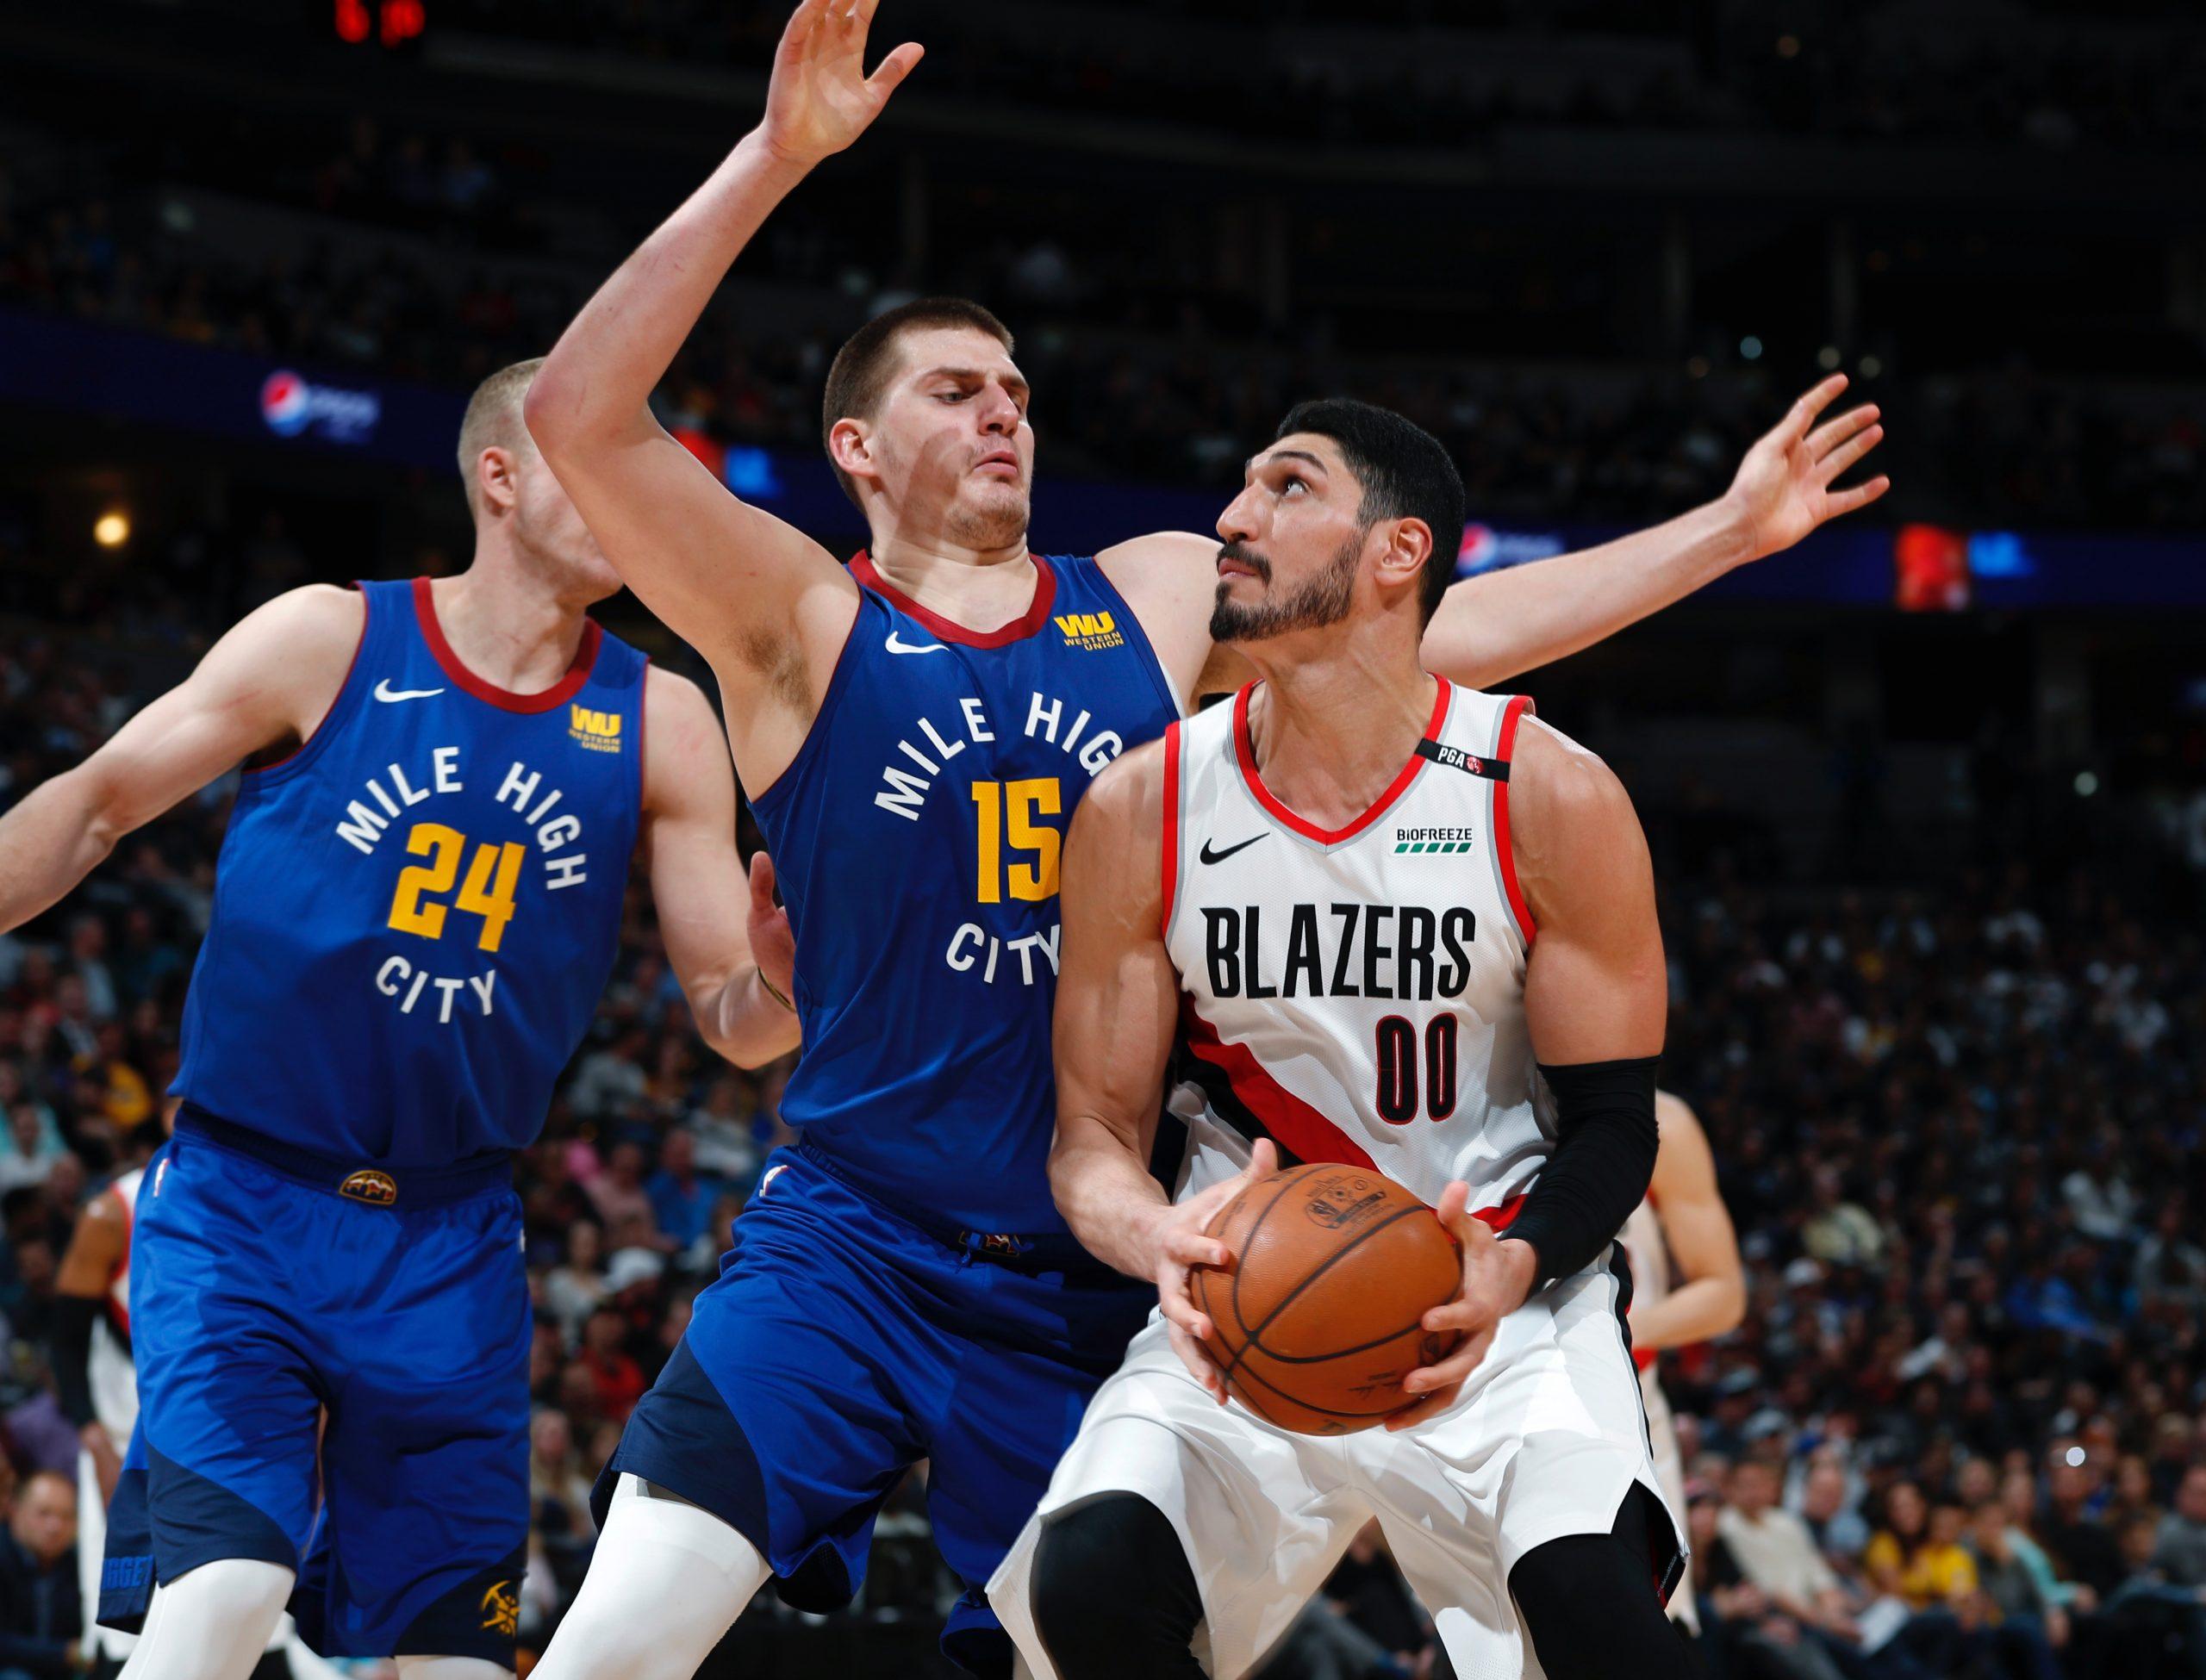 Denver Nuggets vs. Portland Trail Blazers basketball game.